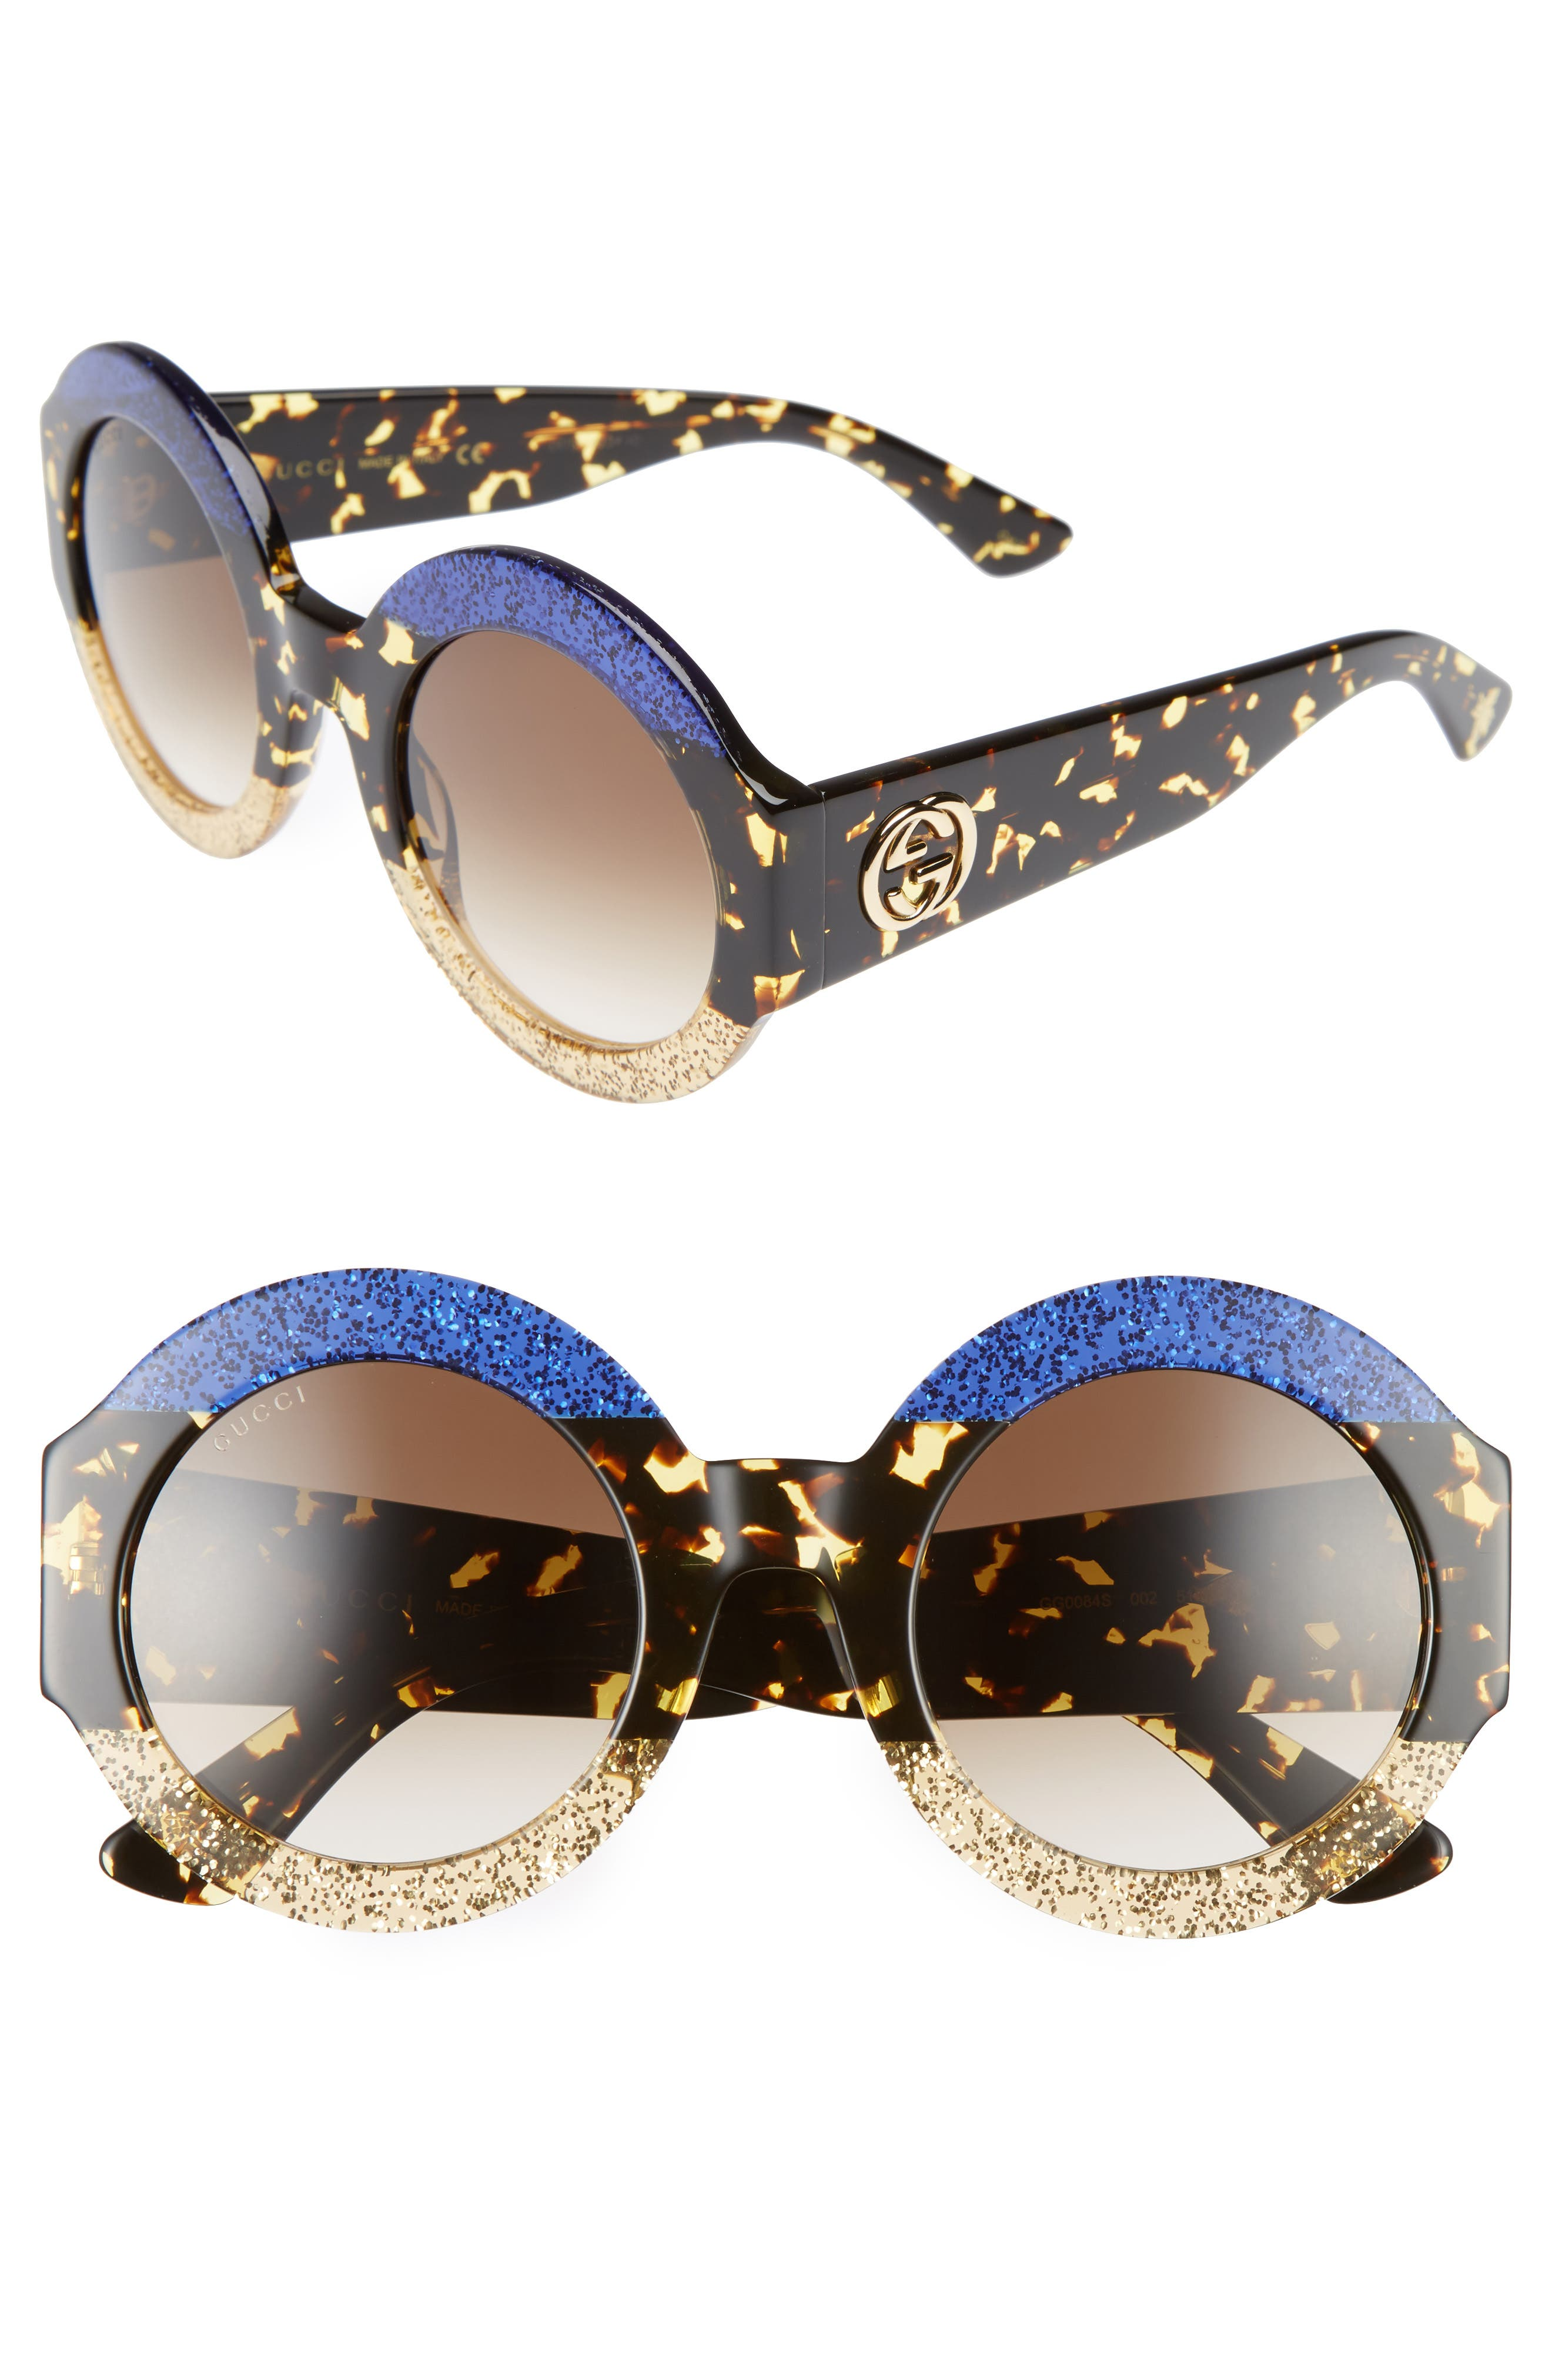 51mm Round Sunglasses,                             Main thumbnail 1, color,                             400